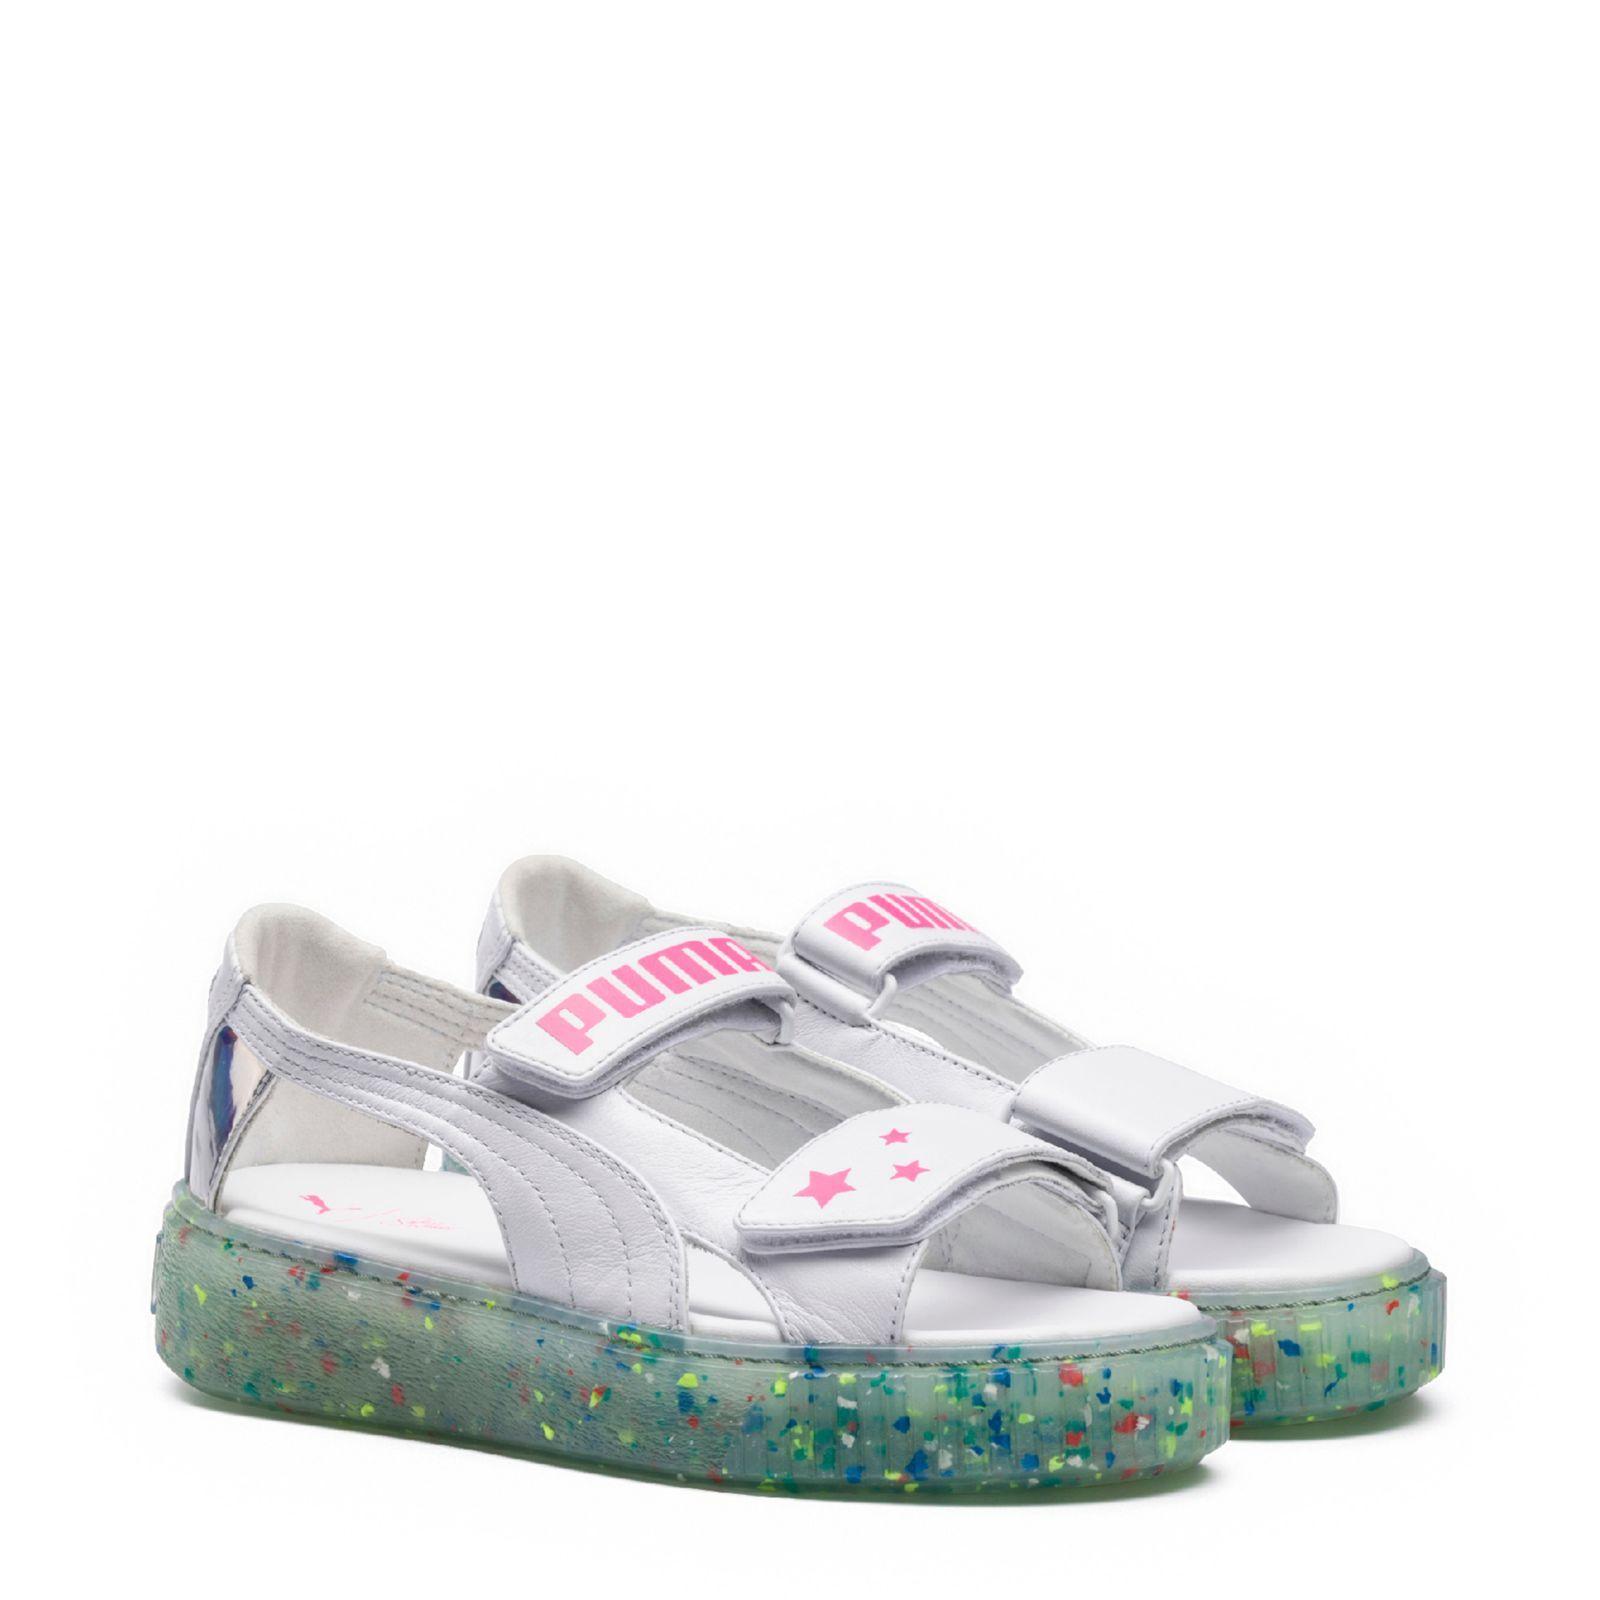 Puma x Sophia Webster Flatform Sandal